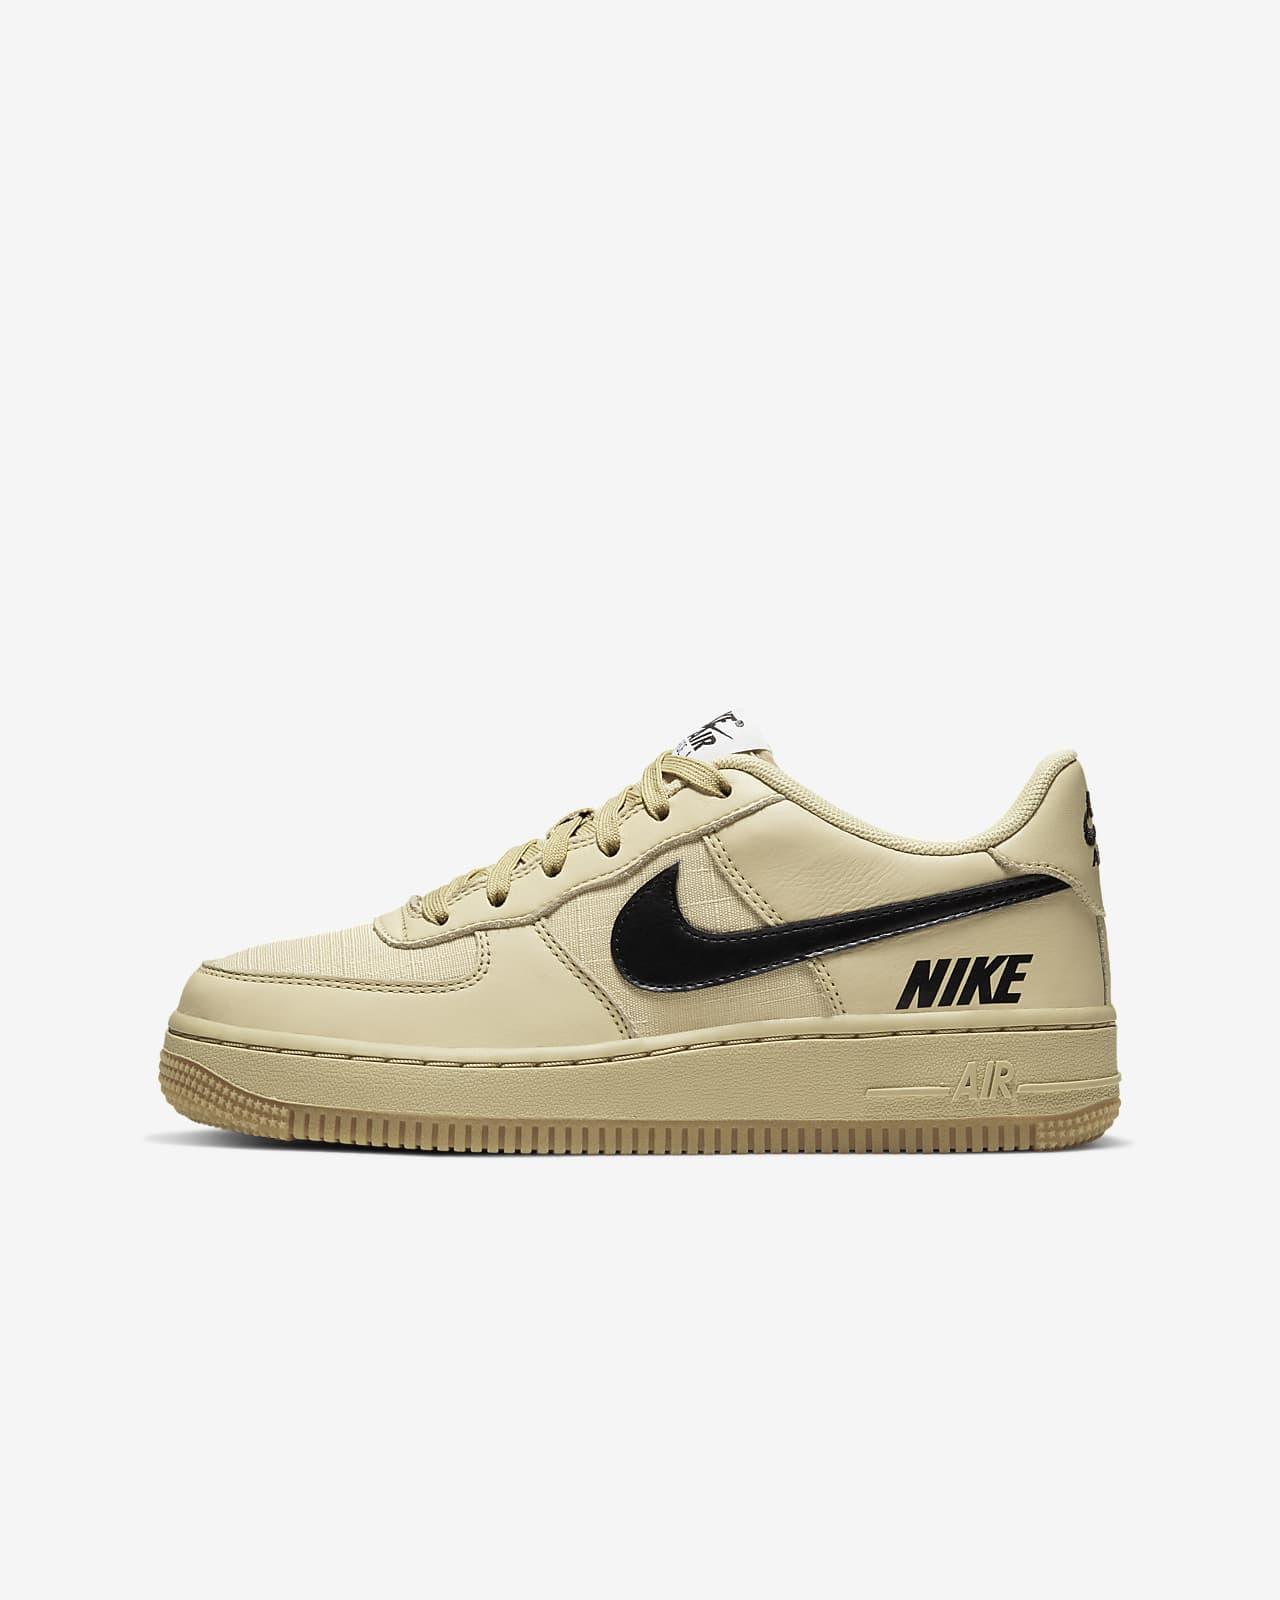 Nike Air Force 1 LV8 5 (GS) 大童运动童鞋